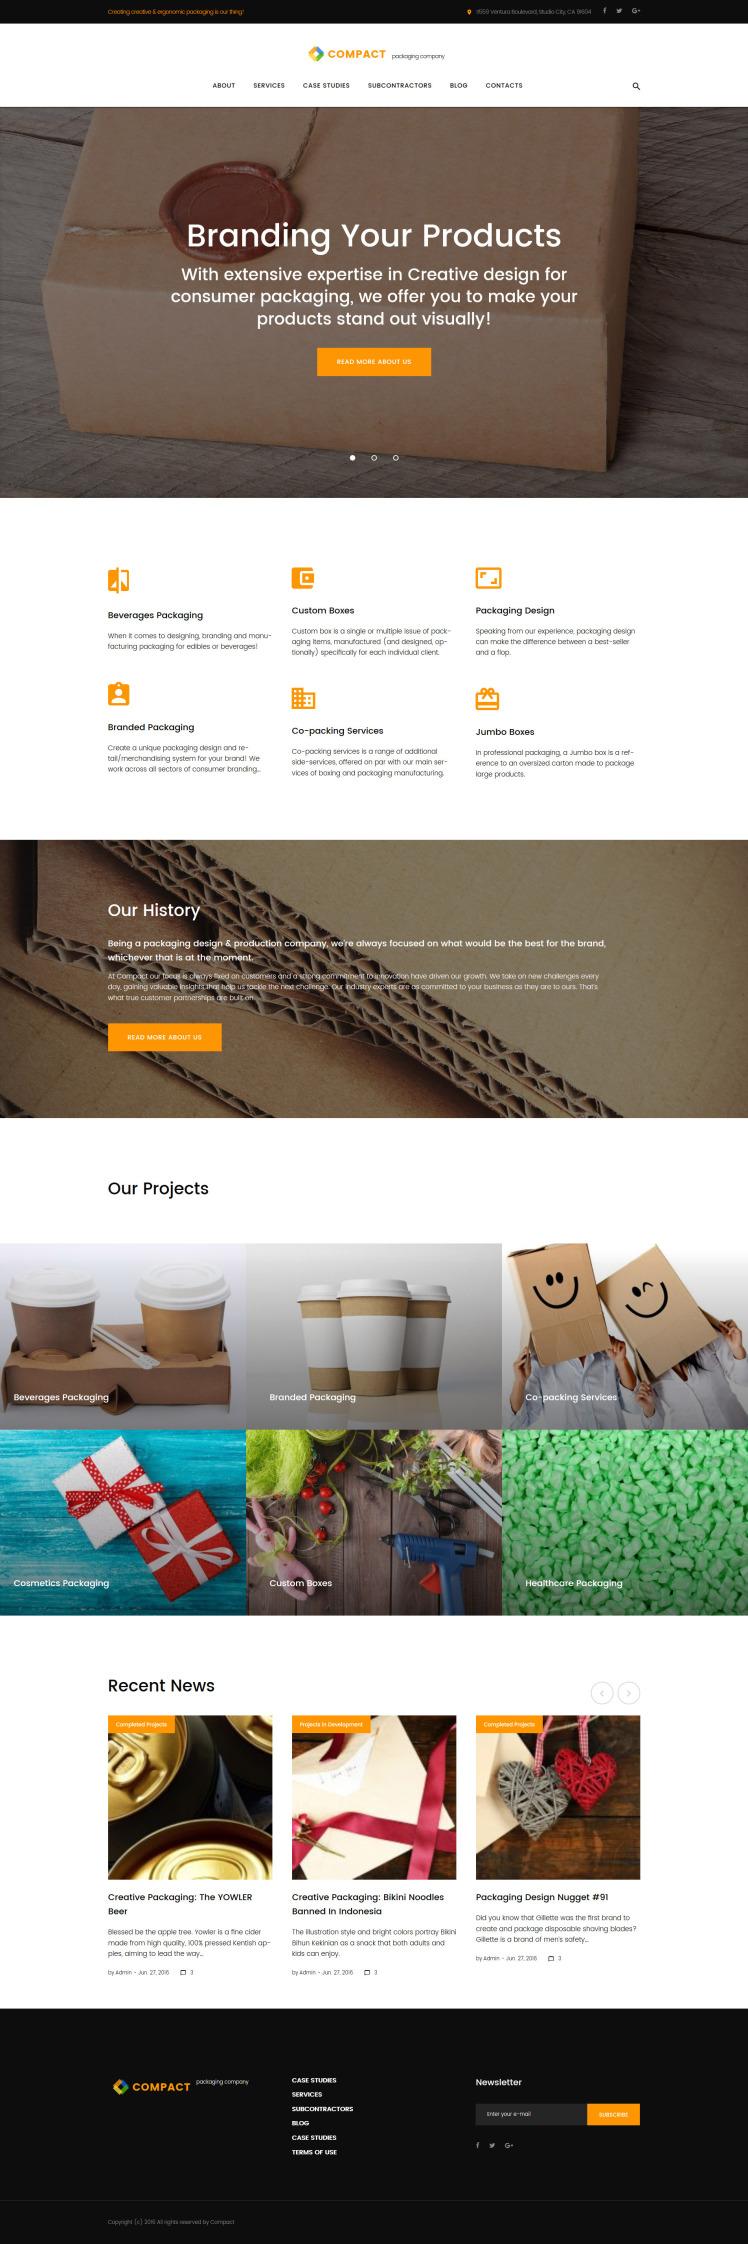 Compact Packaging Company WordPress Theme